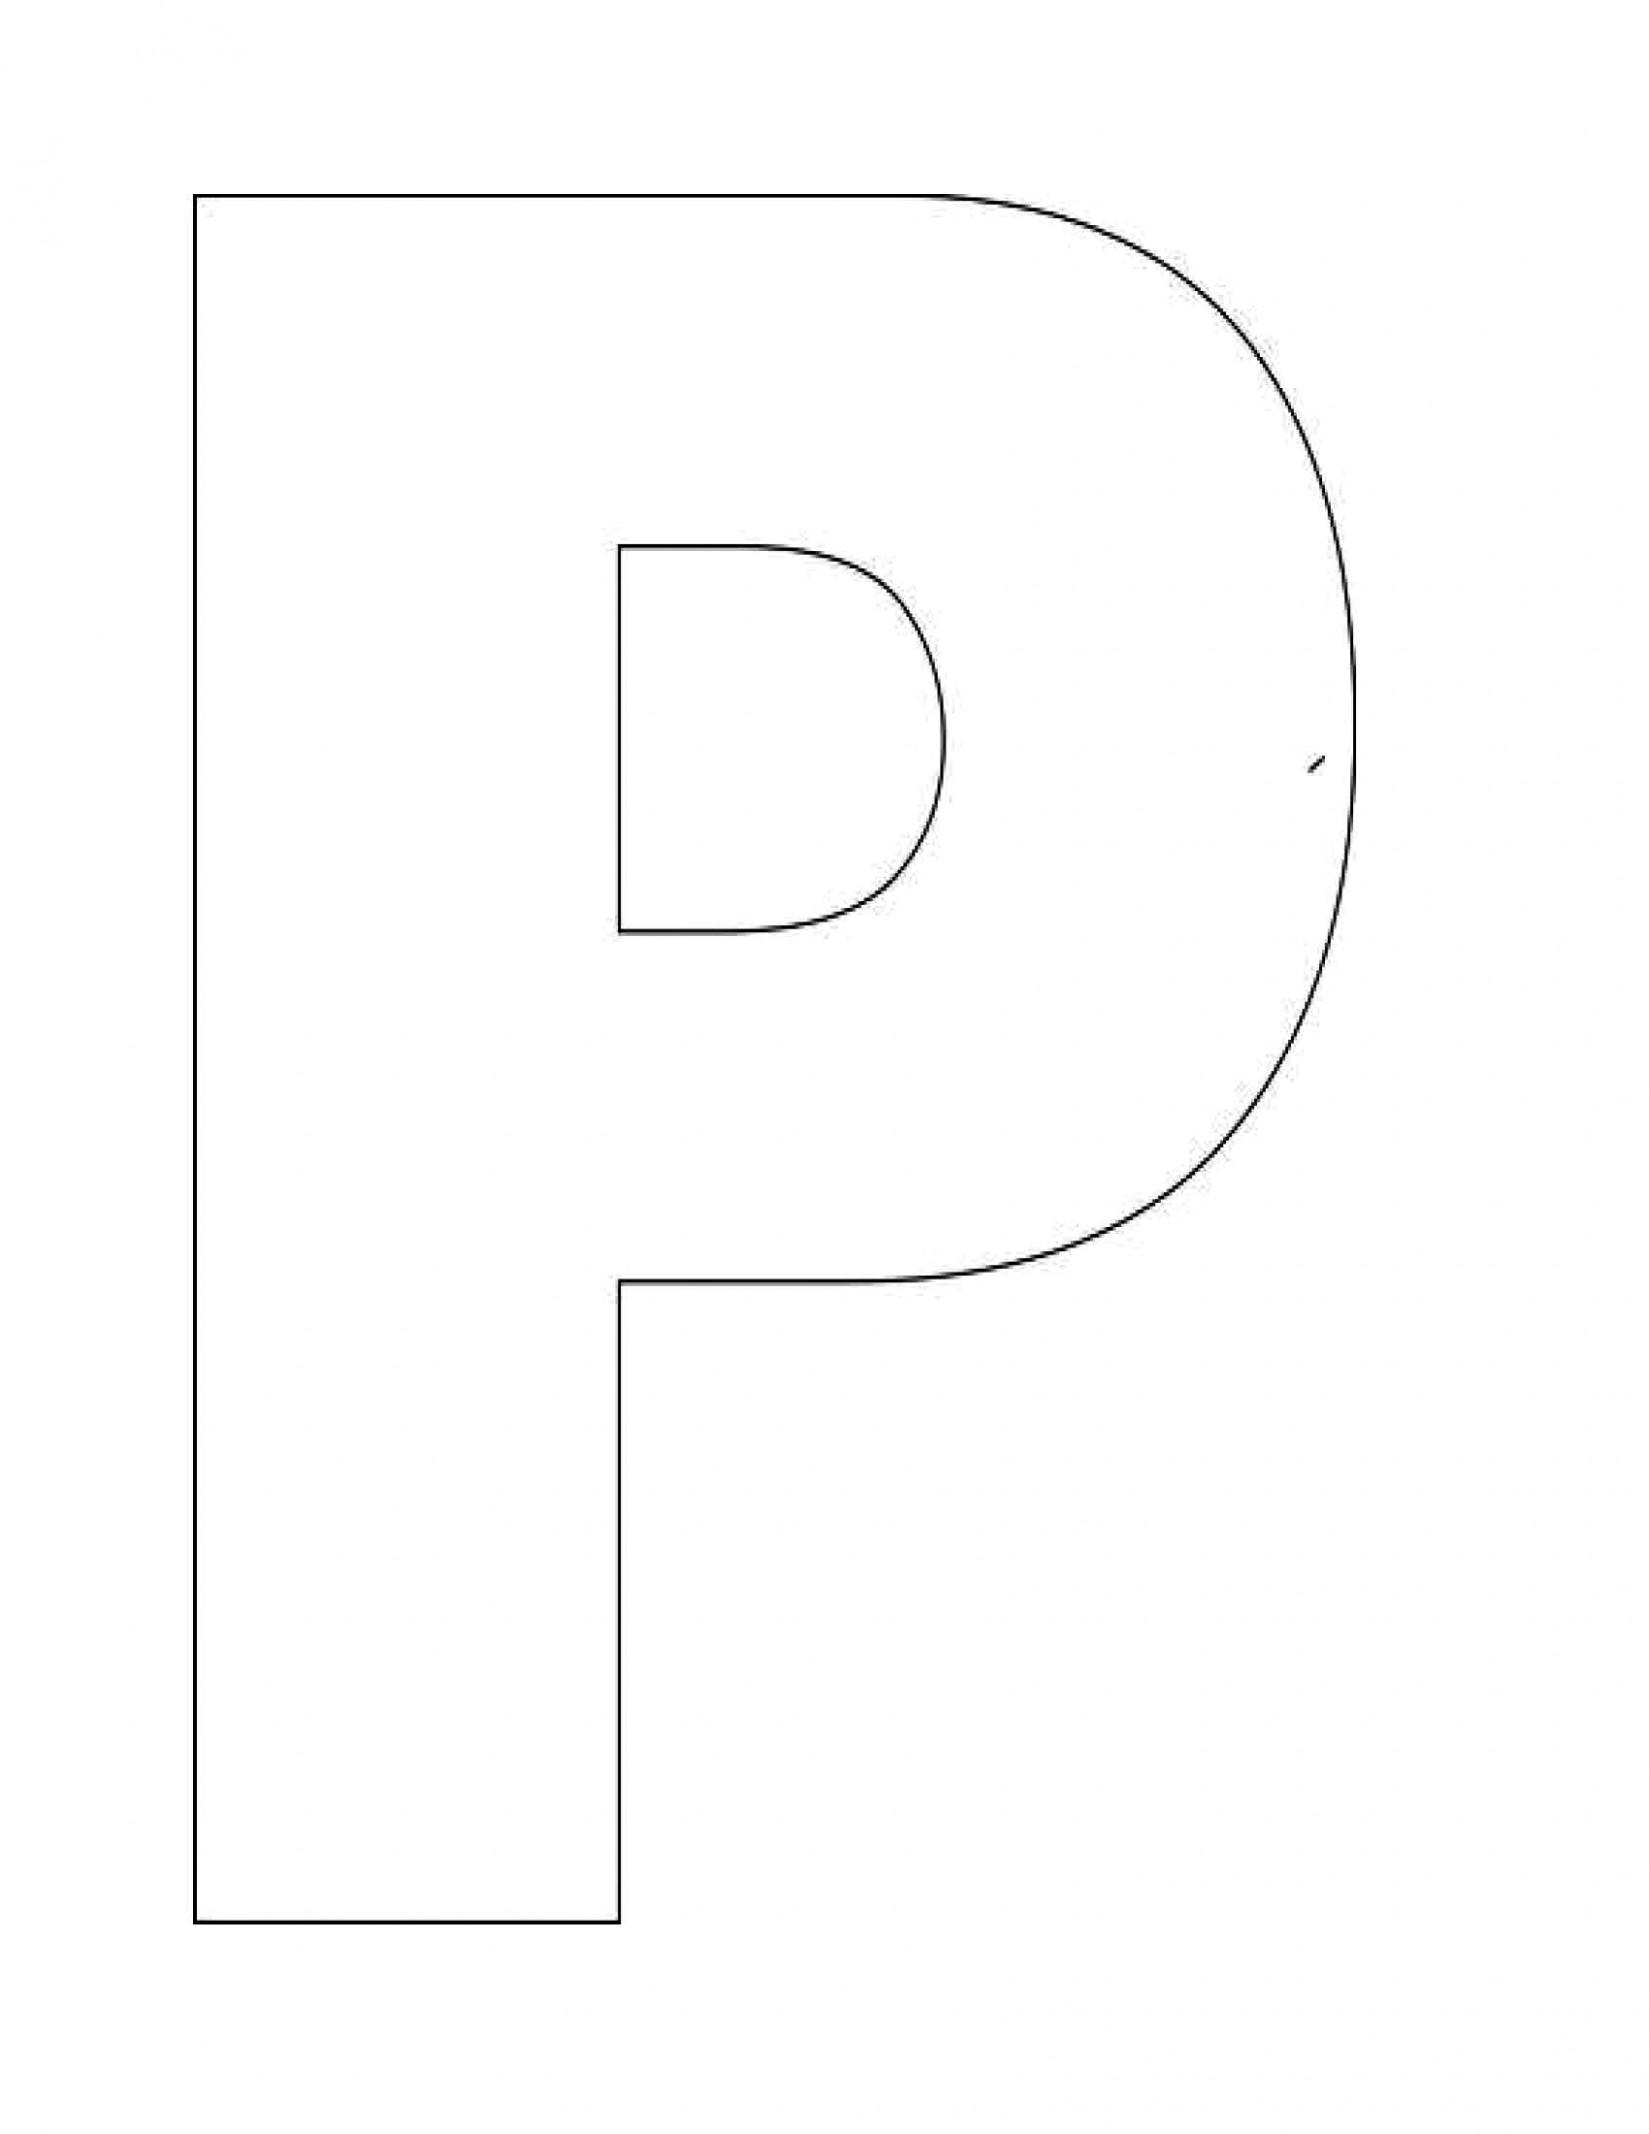 letter p template free  Alphabet Project : P | Serenity - letter p template free